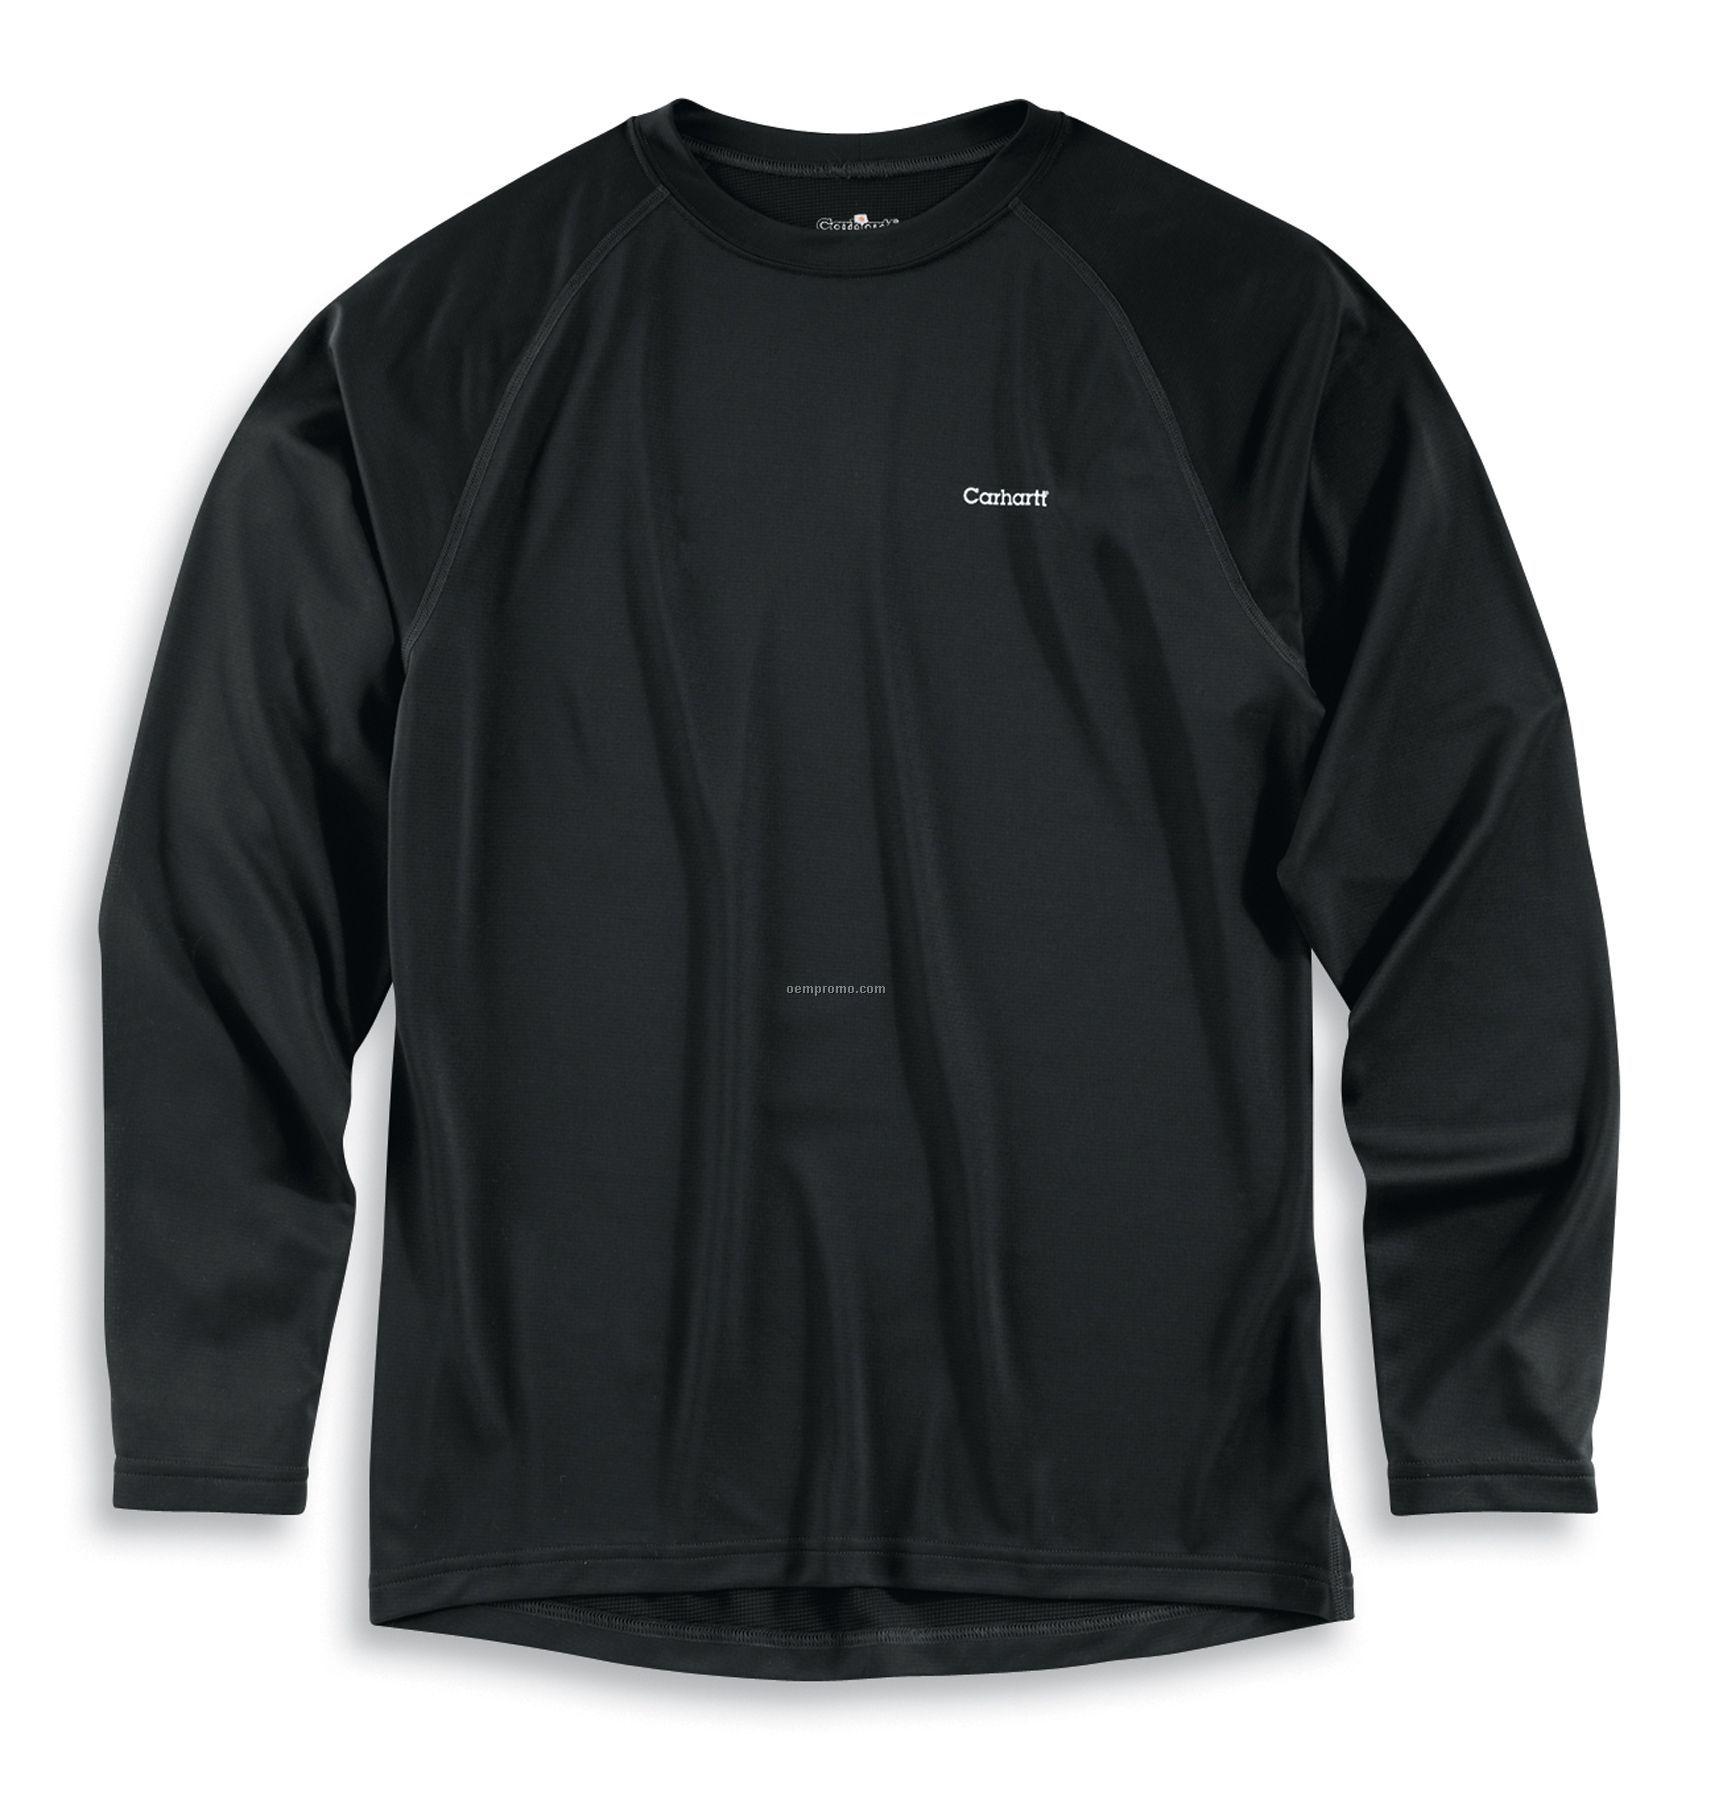 Carhartt Men's Lightweight Thermal Crewneck Shirt W/ Work Dry Base Layer